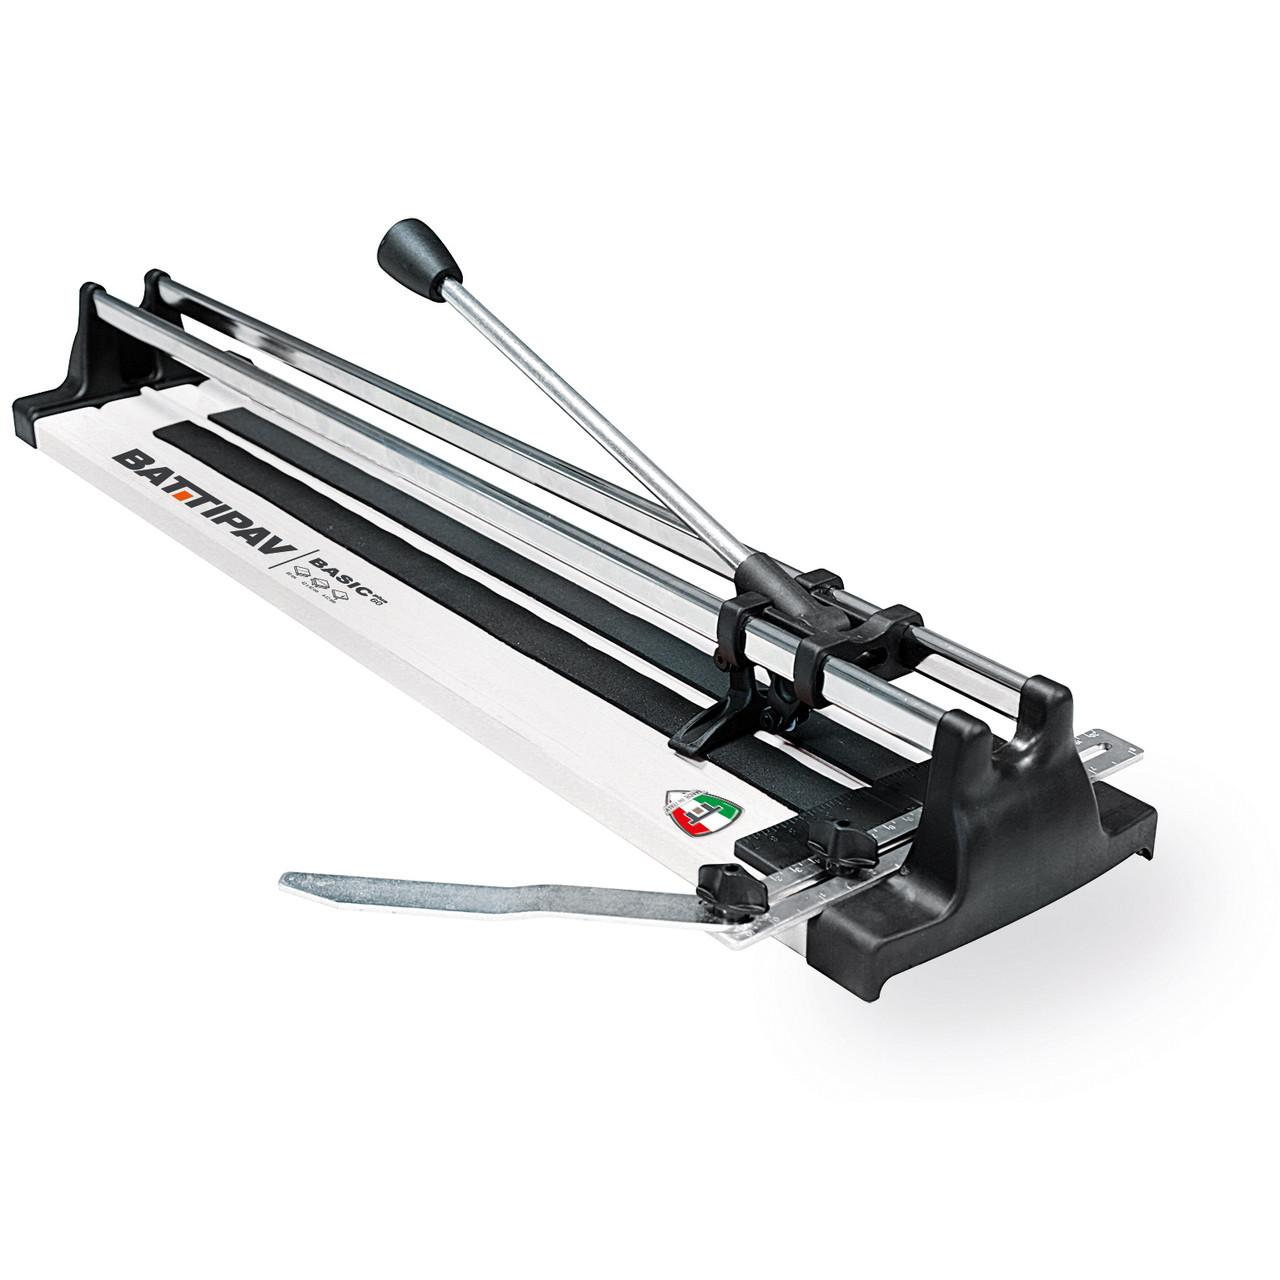 Battipav Basic Plus 600mm Manual Tile Cutter (2060)